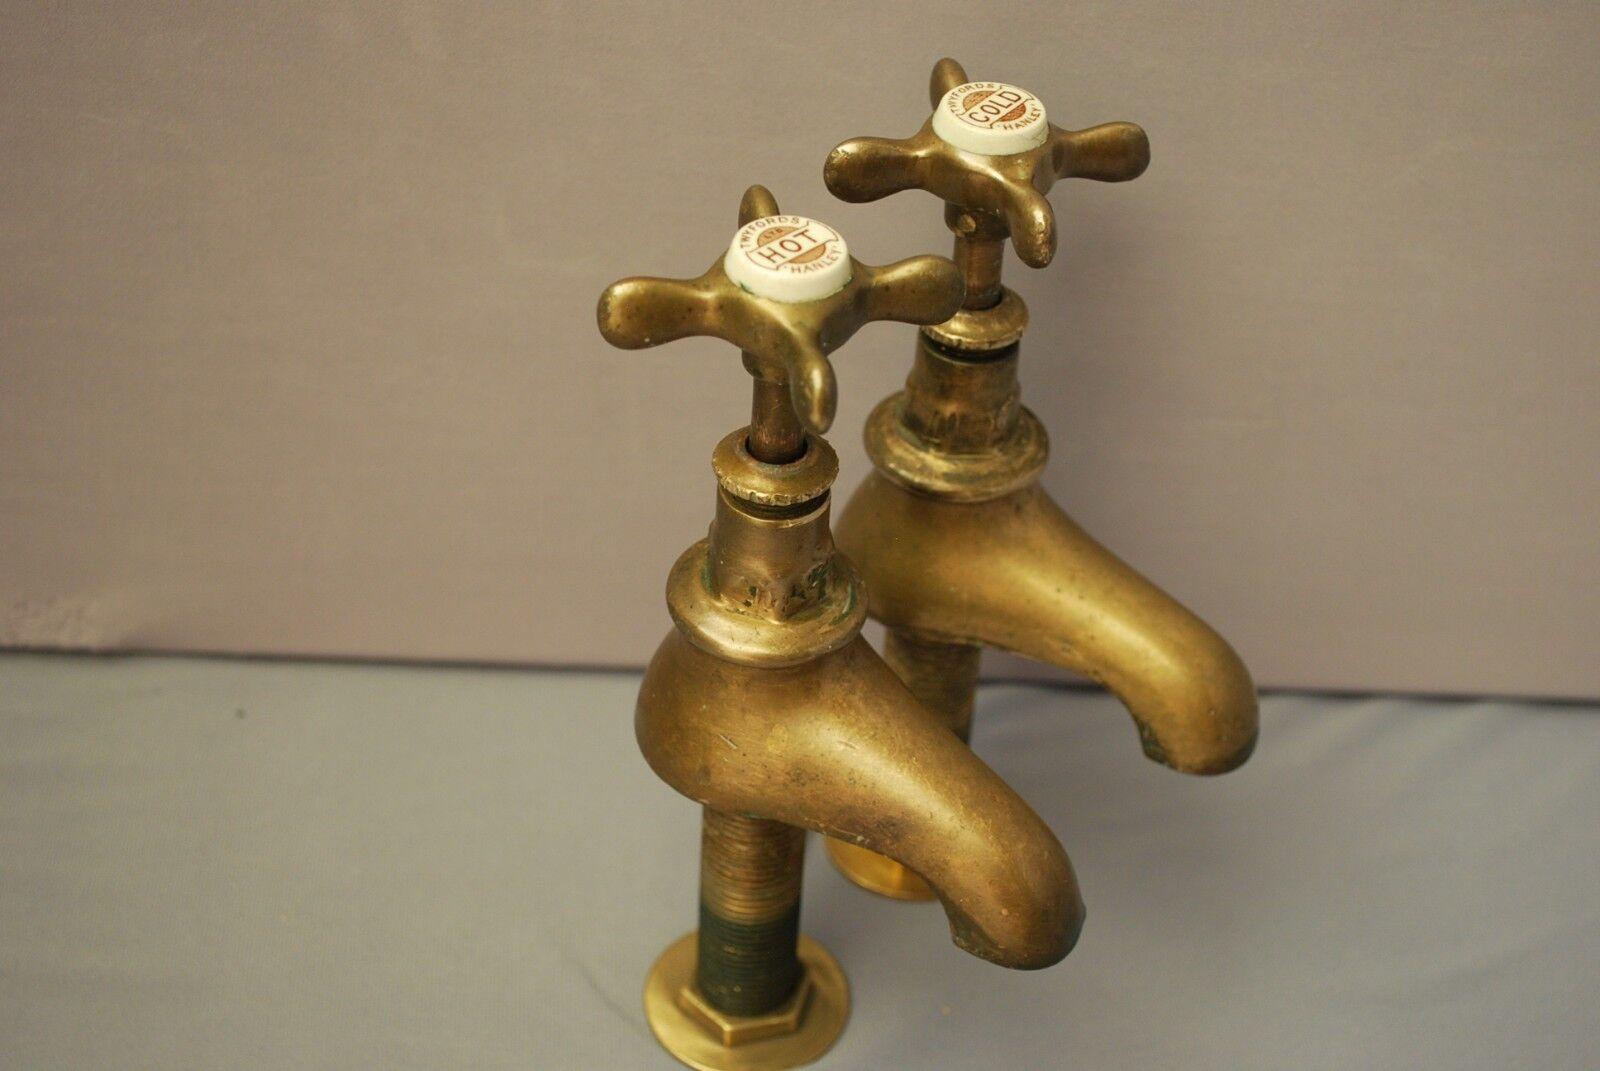 Laiton bassin robinets Original Patine robinets Reclaimed & entièrement remis à neuf ANCIENS ROBINETS